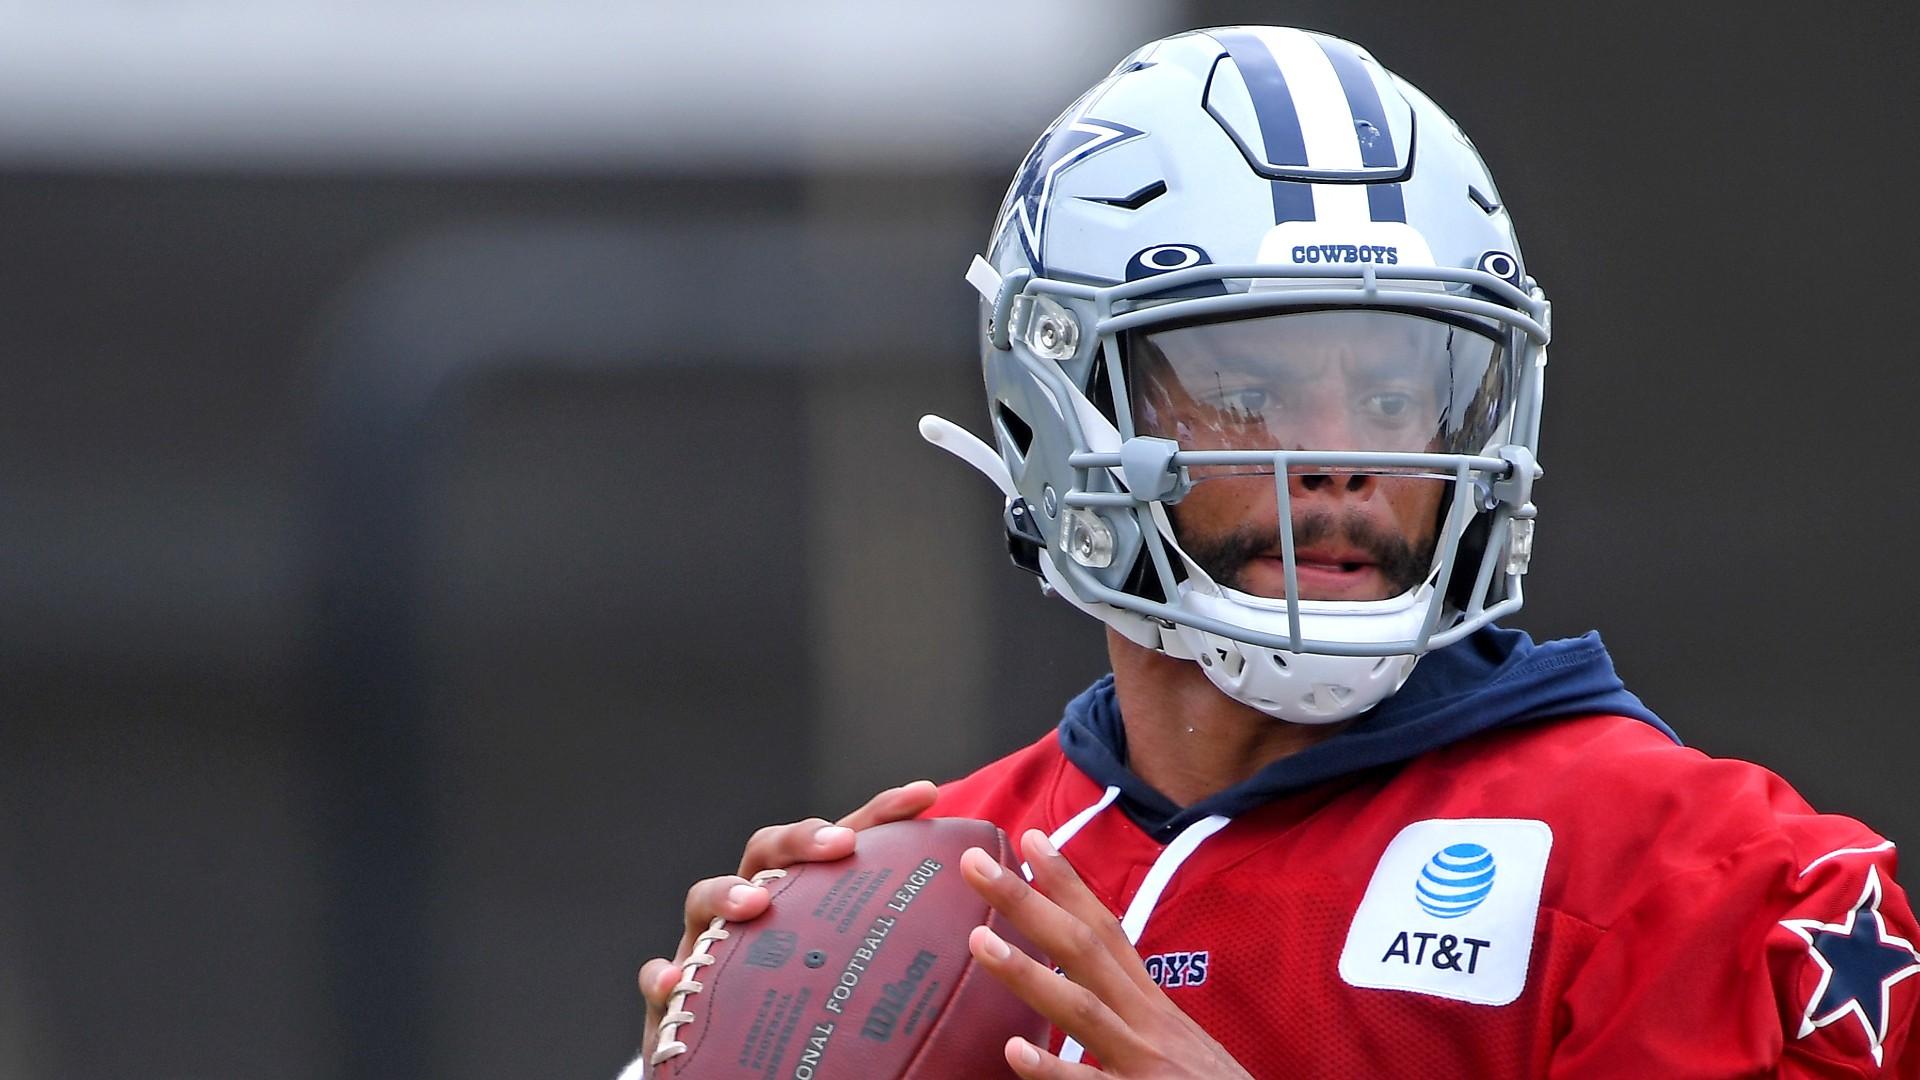 Dak Prescott injury update: Cowboys QB set for MRI on shoulder; team says 'not a reason to worry'